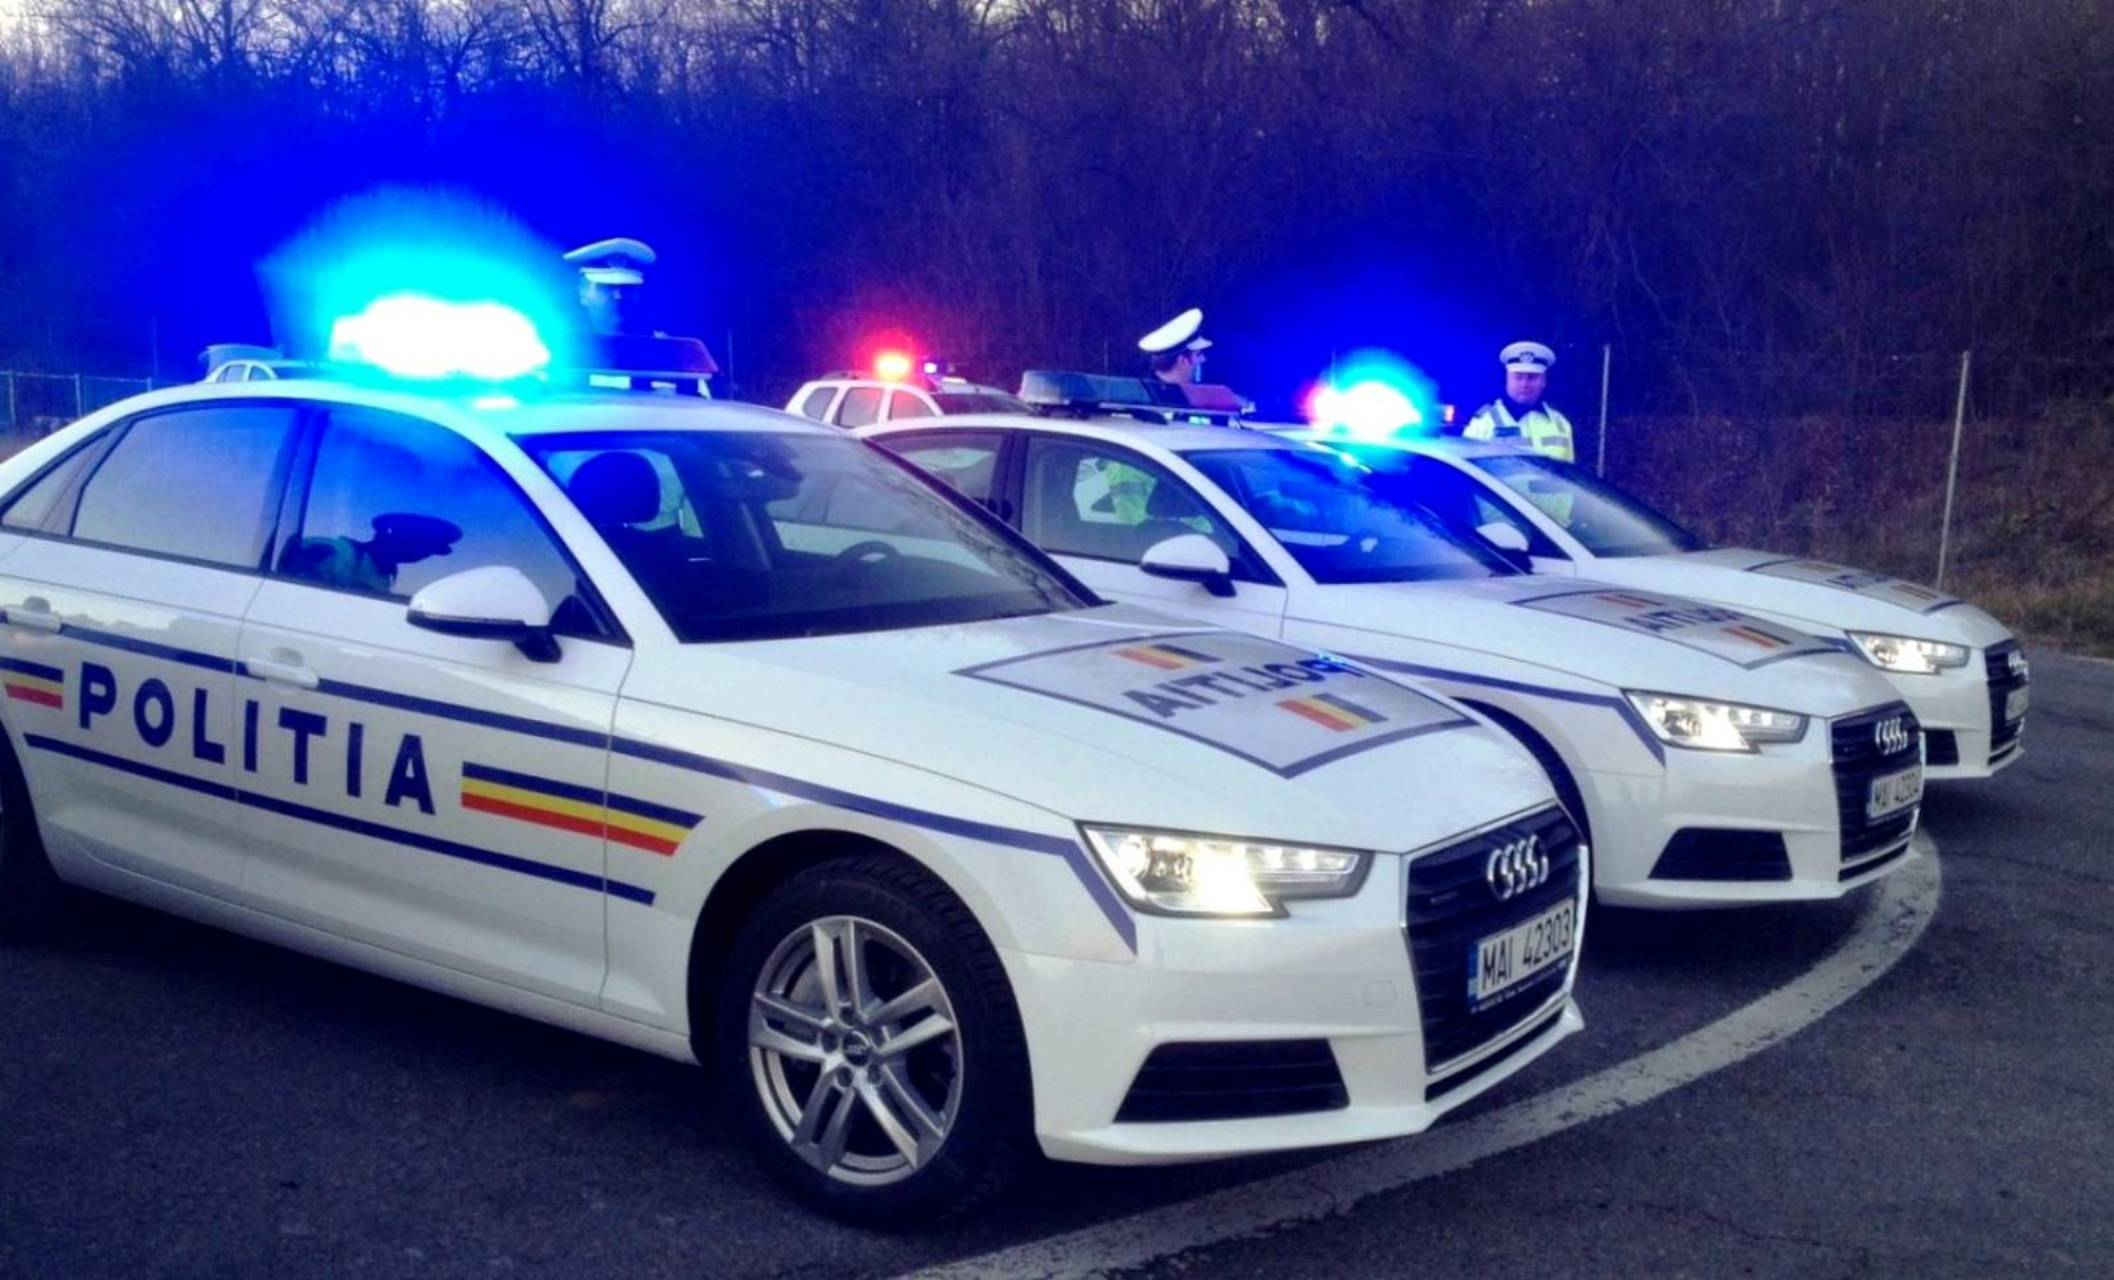 Politia Romana Apelul URGENTA Romani